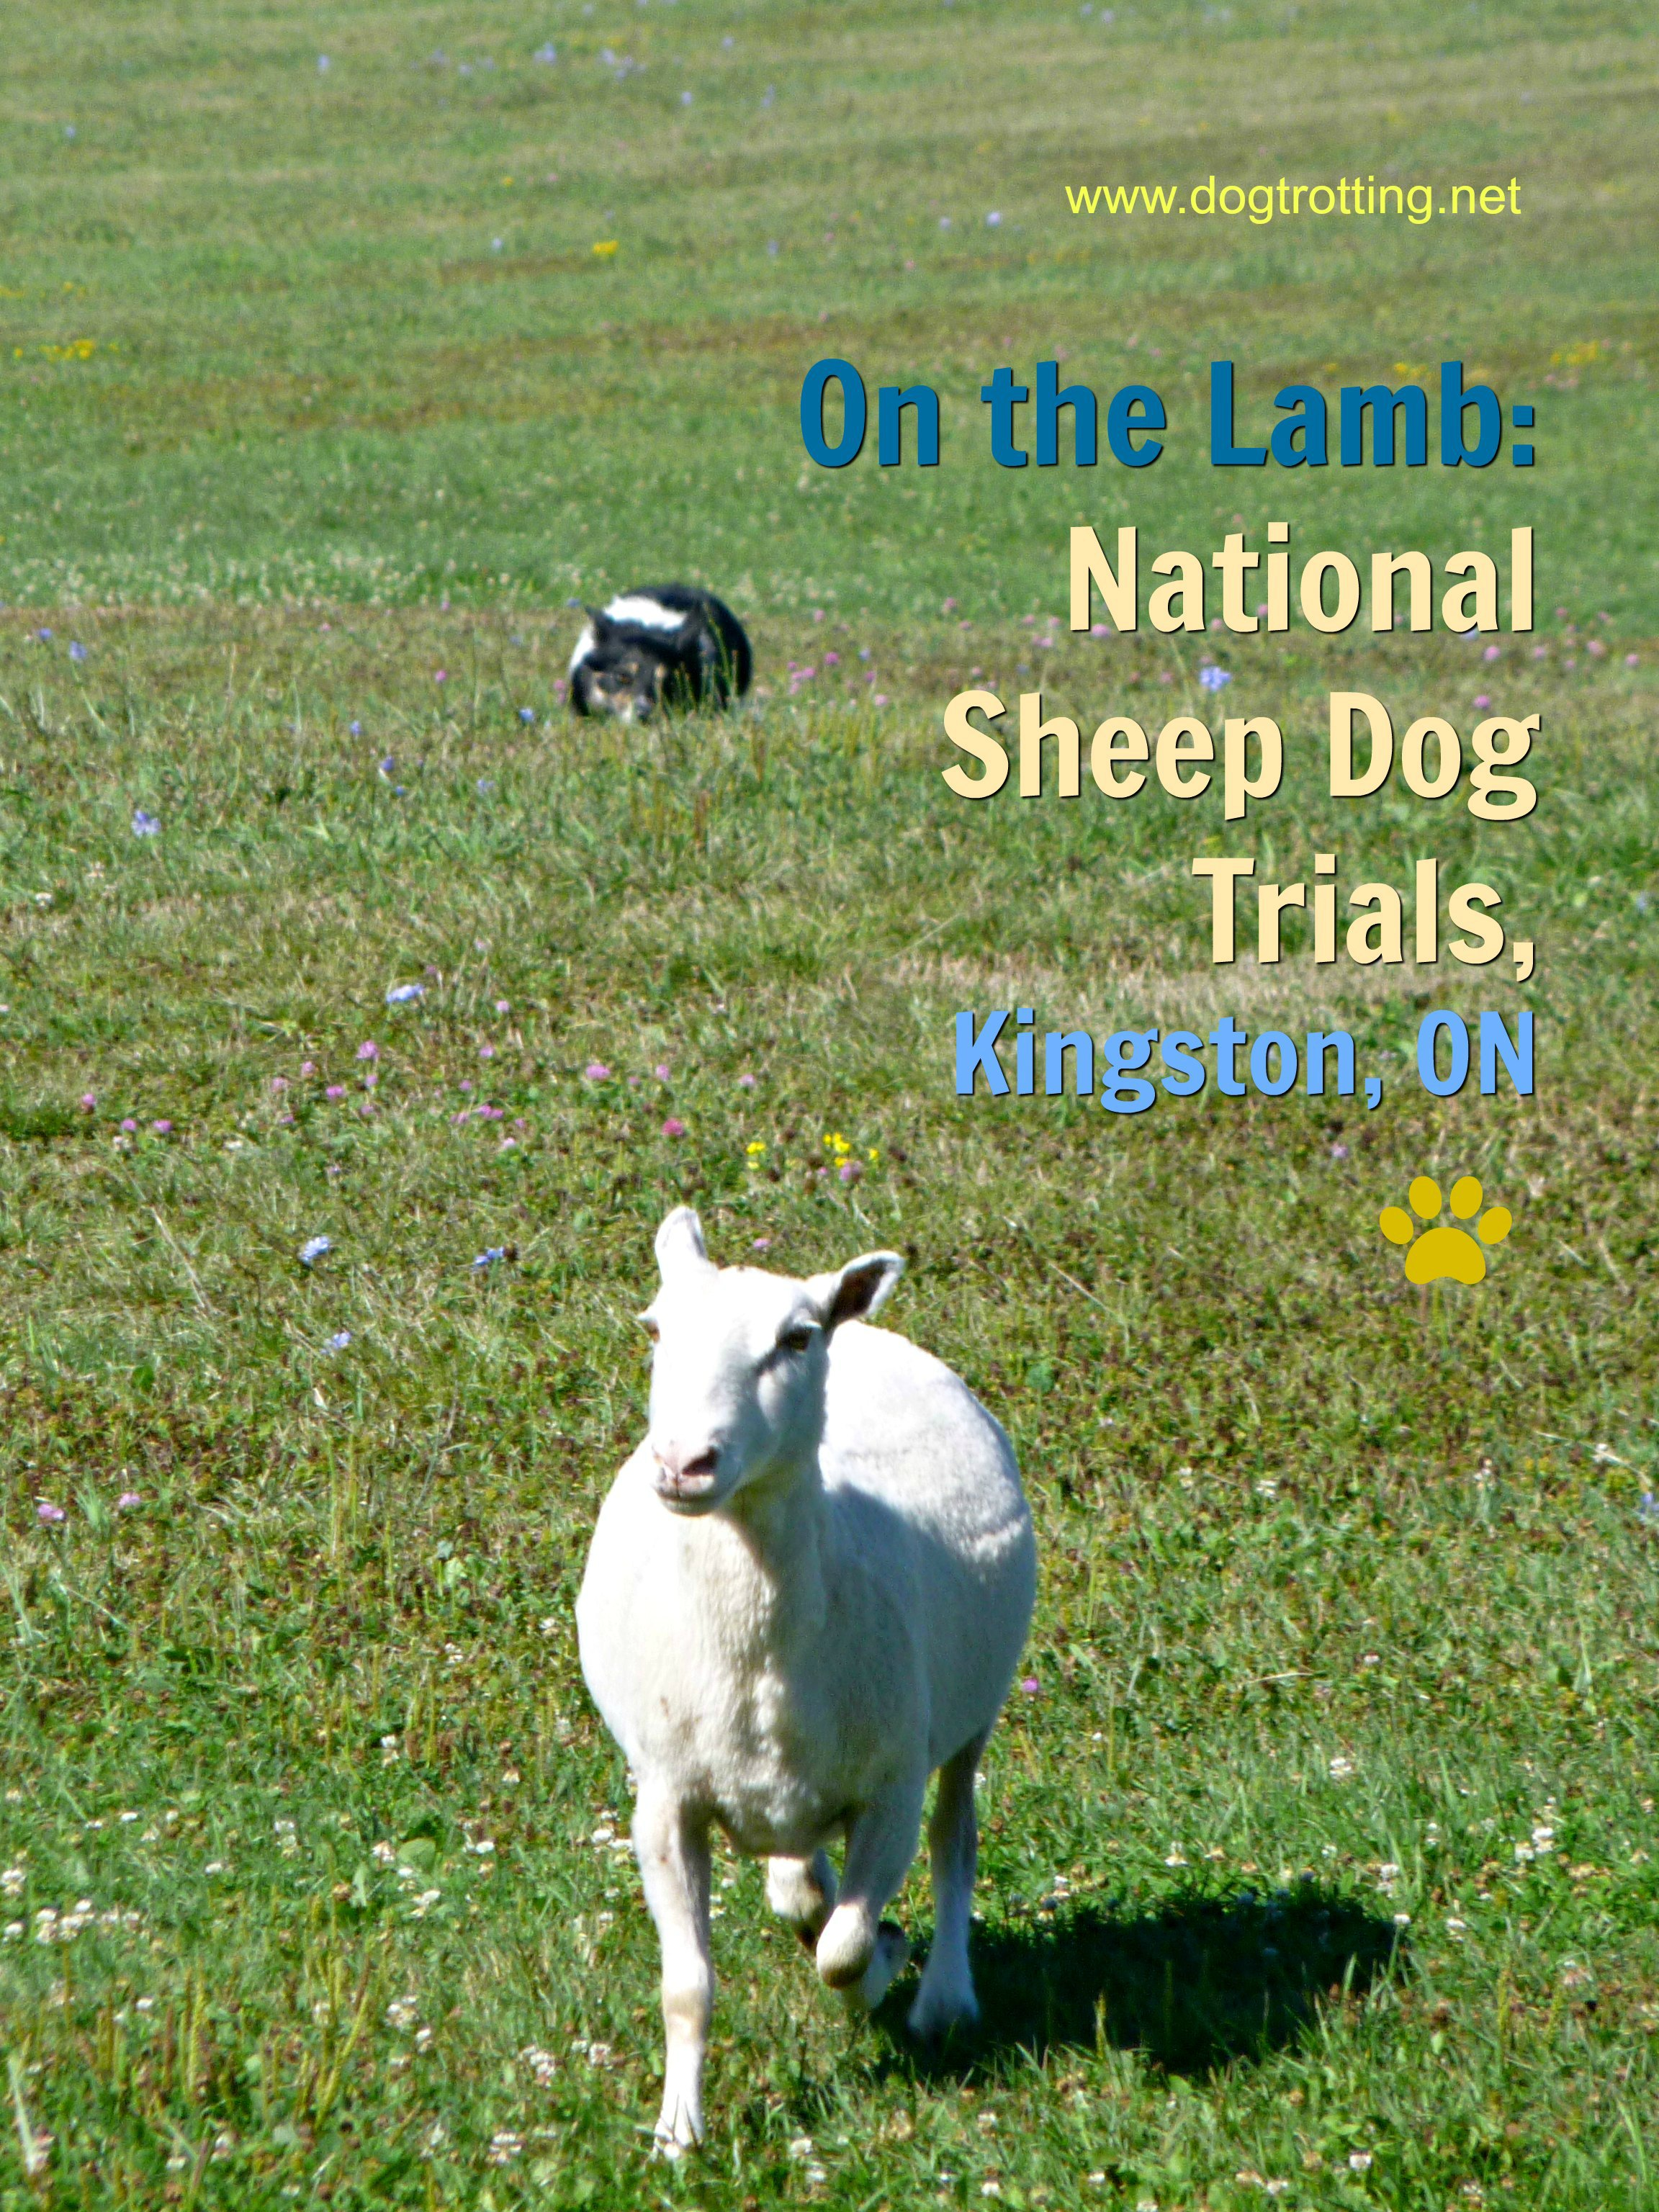 National Sheep Dog Trials, Kingston, Ontario